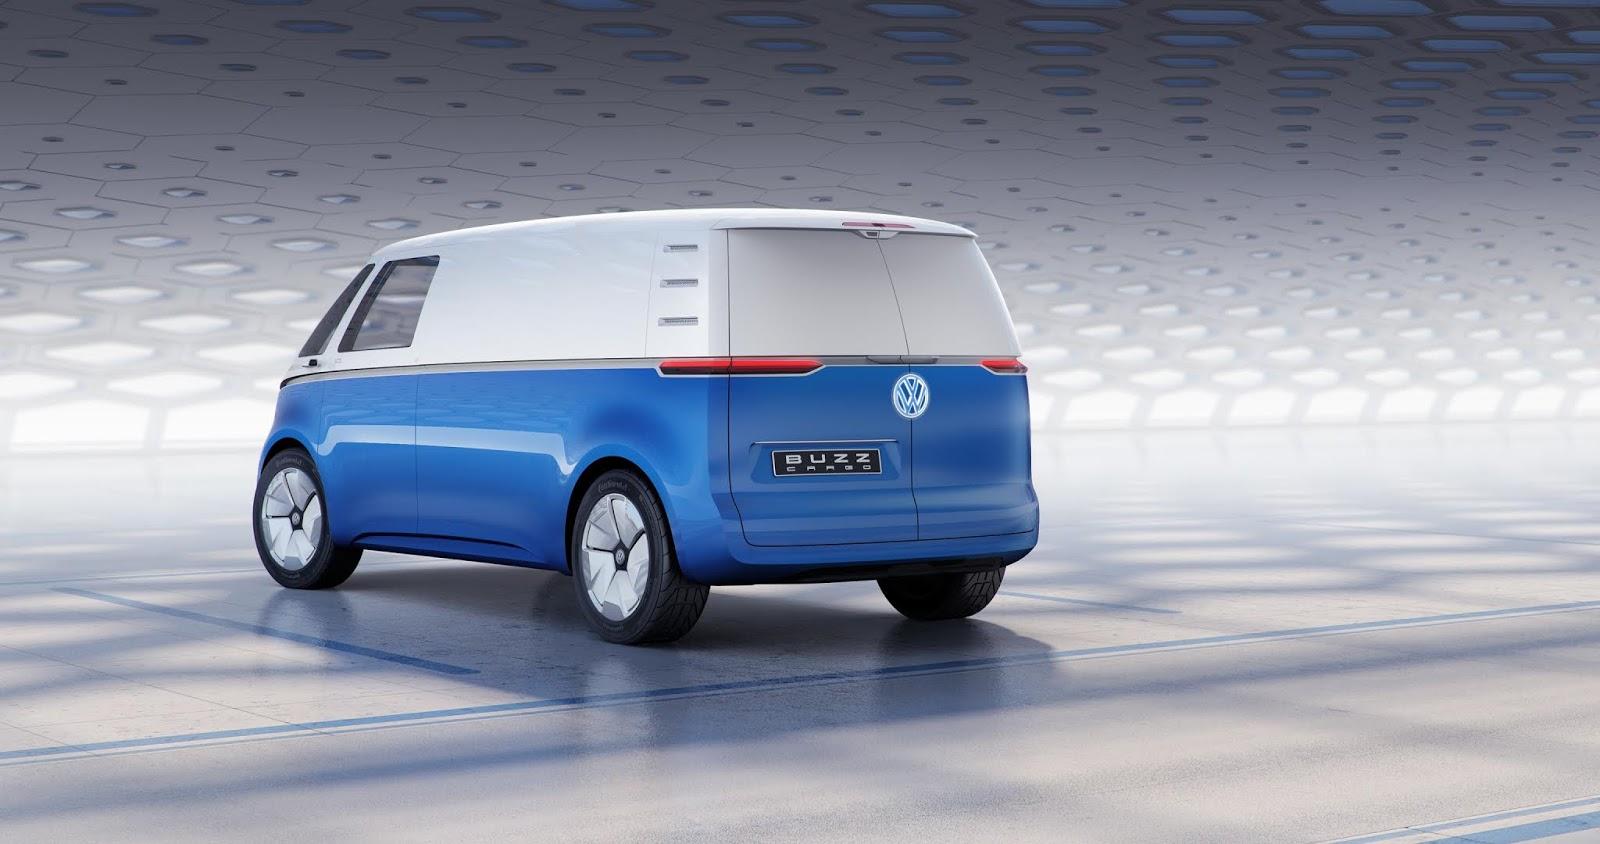 VOLKSWAGEN2BI.D.2BBUZZ2BCARGO2B2 Αυτό είναι το νέο, ηλεκτρικό βαν της Volkswagen Electric cars, Volkswagen, VW Transporter, Επαγγελματικά